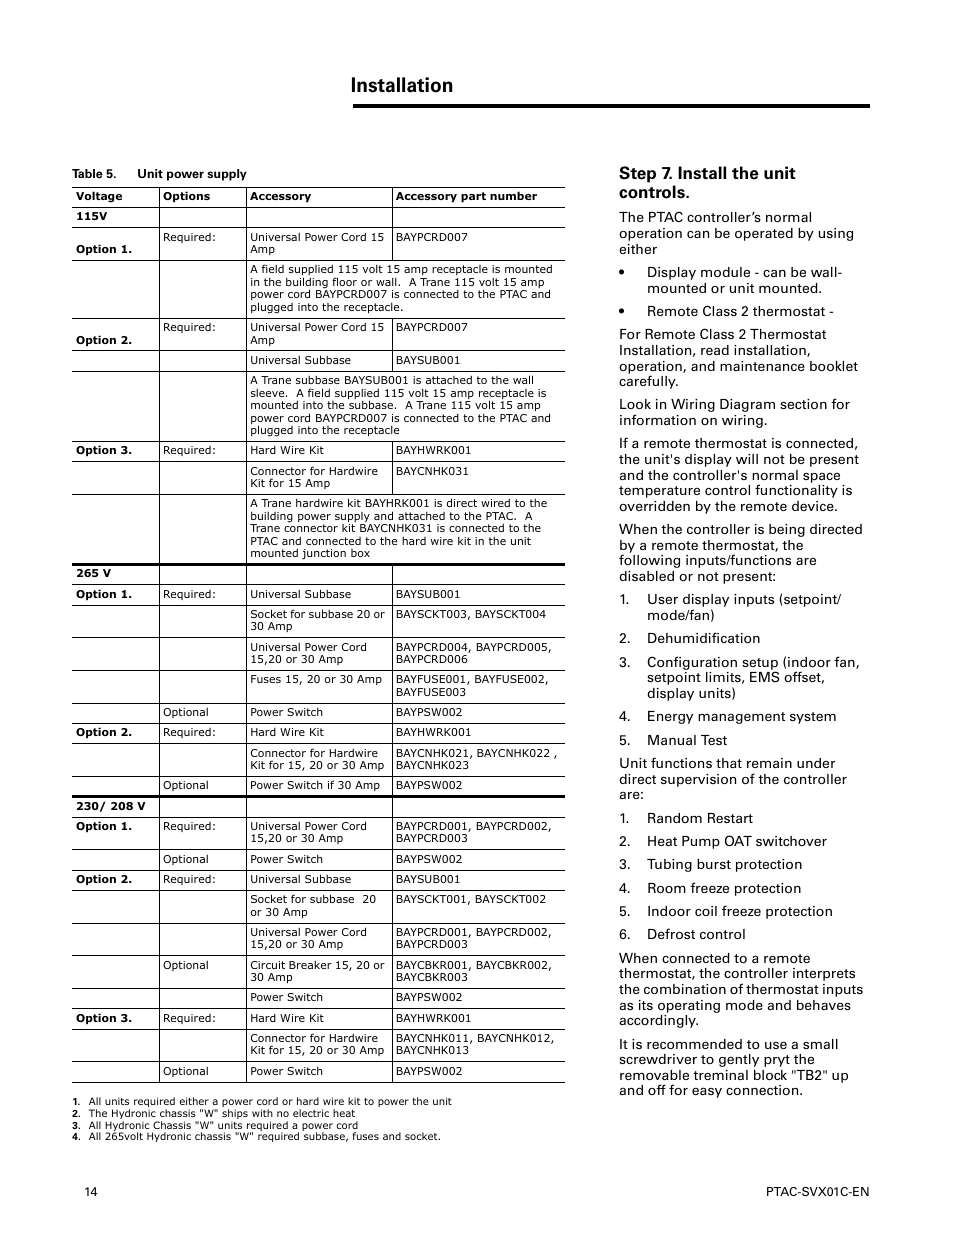 medium resolution of step 7 install the unit controls installation trane ptac svx01c en user manual page 14 52